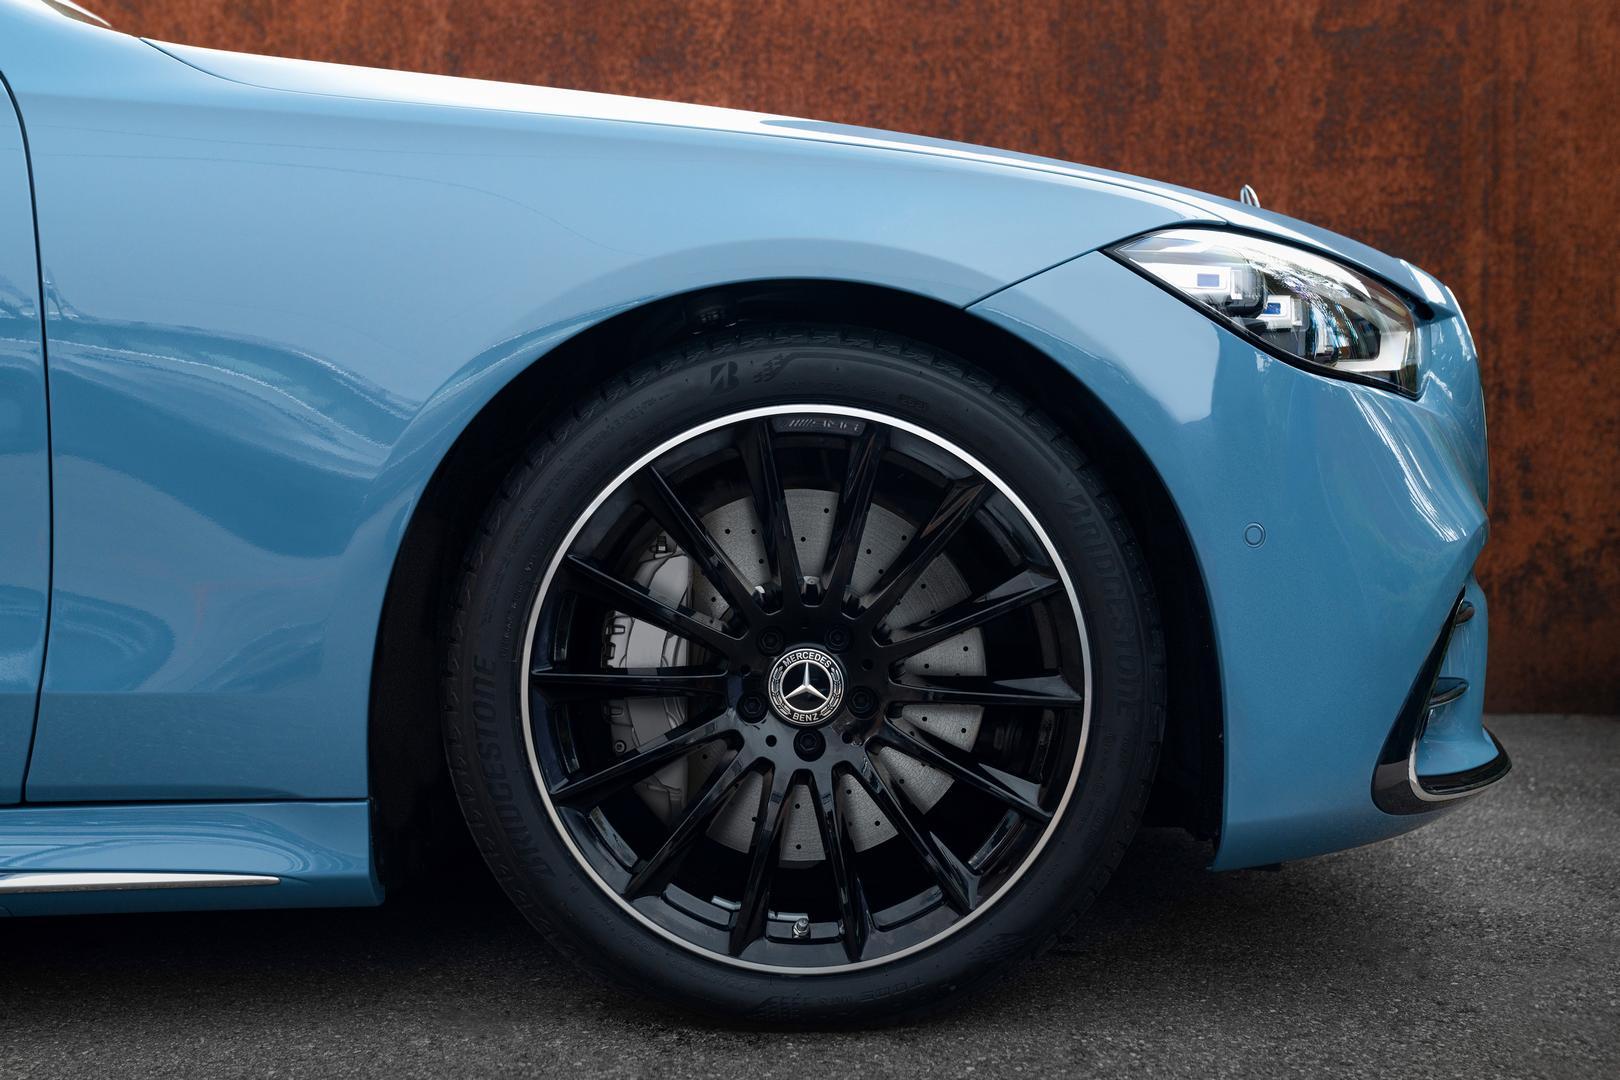 Mercedes-Benz S580 wheels